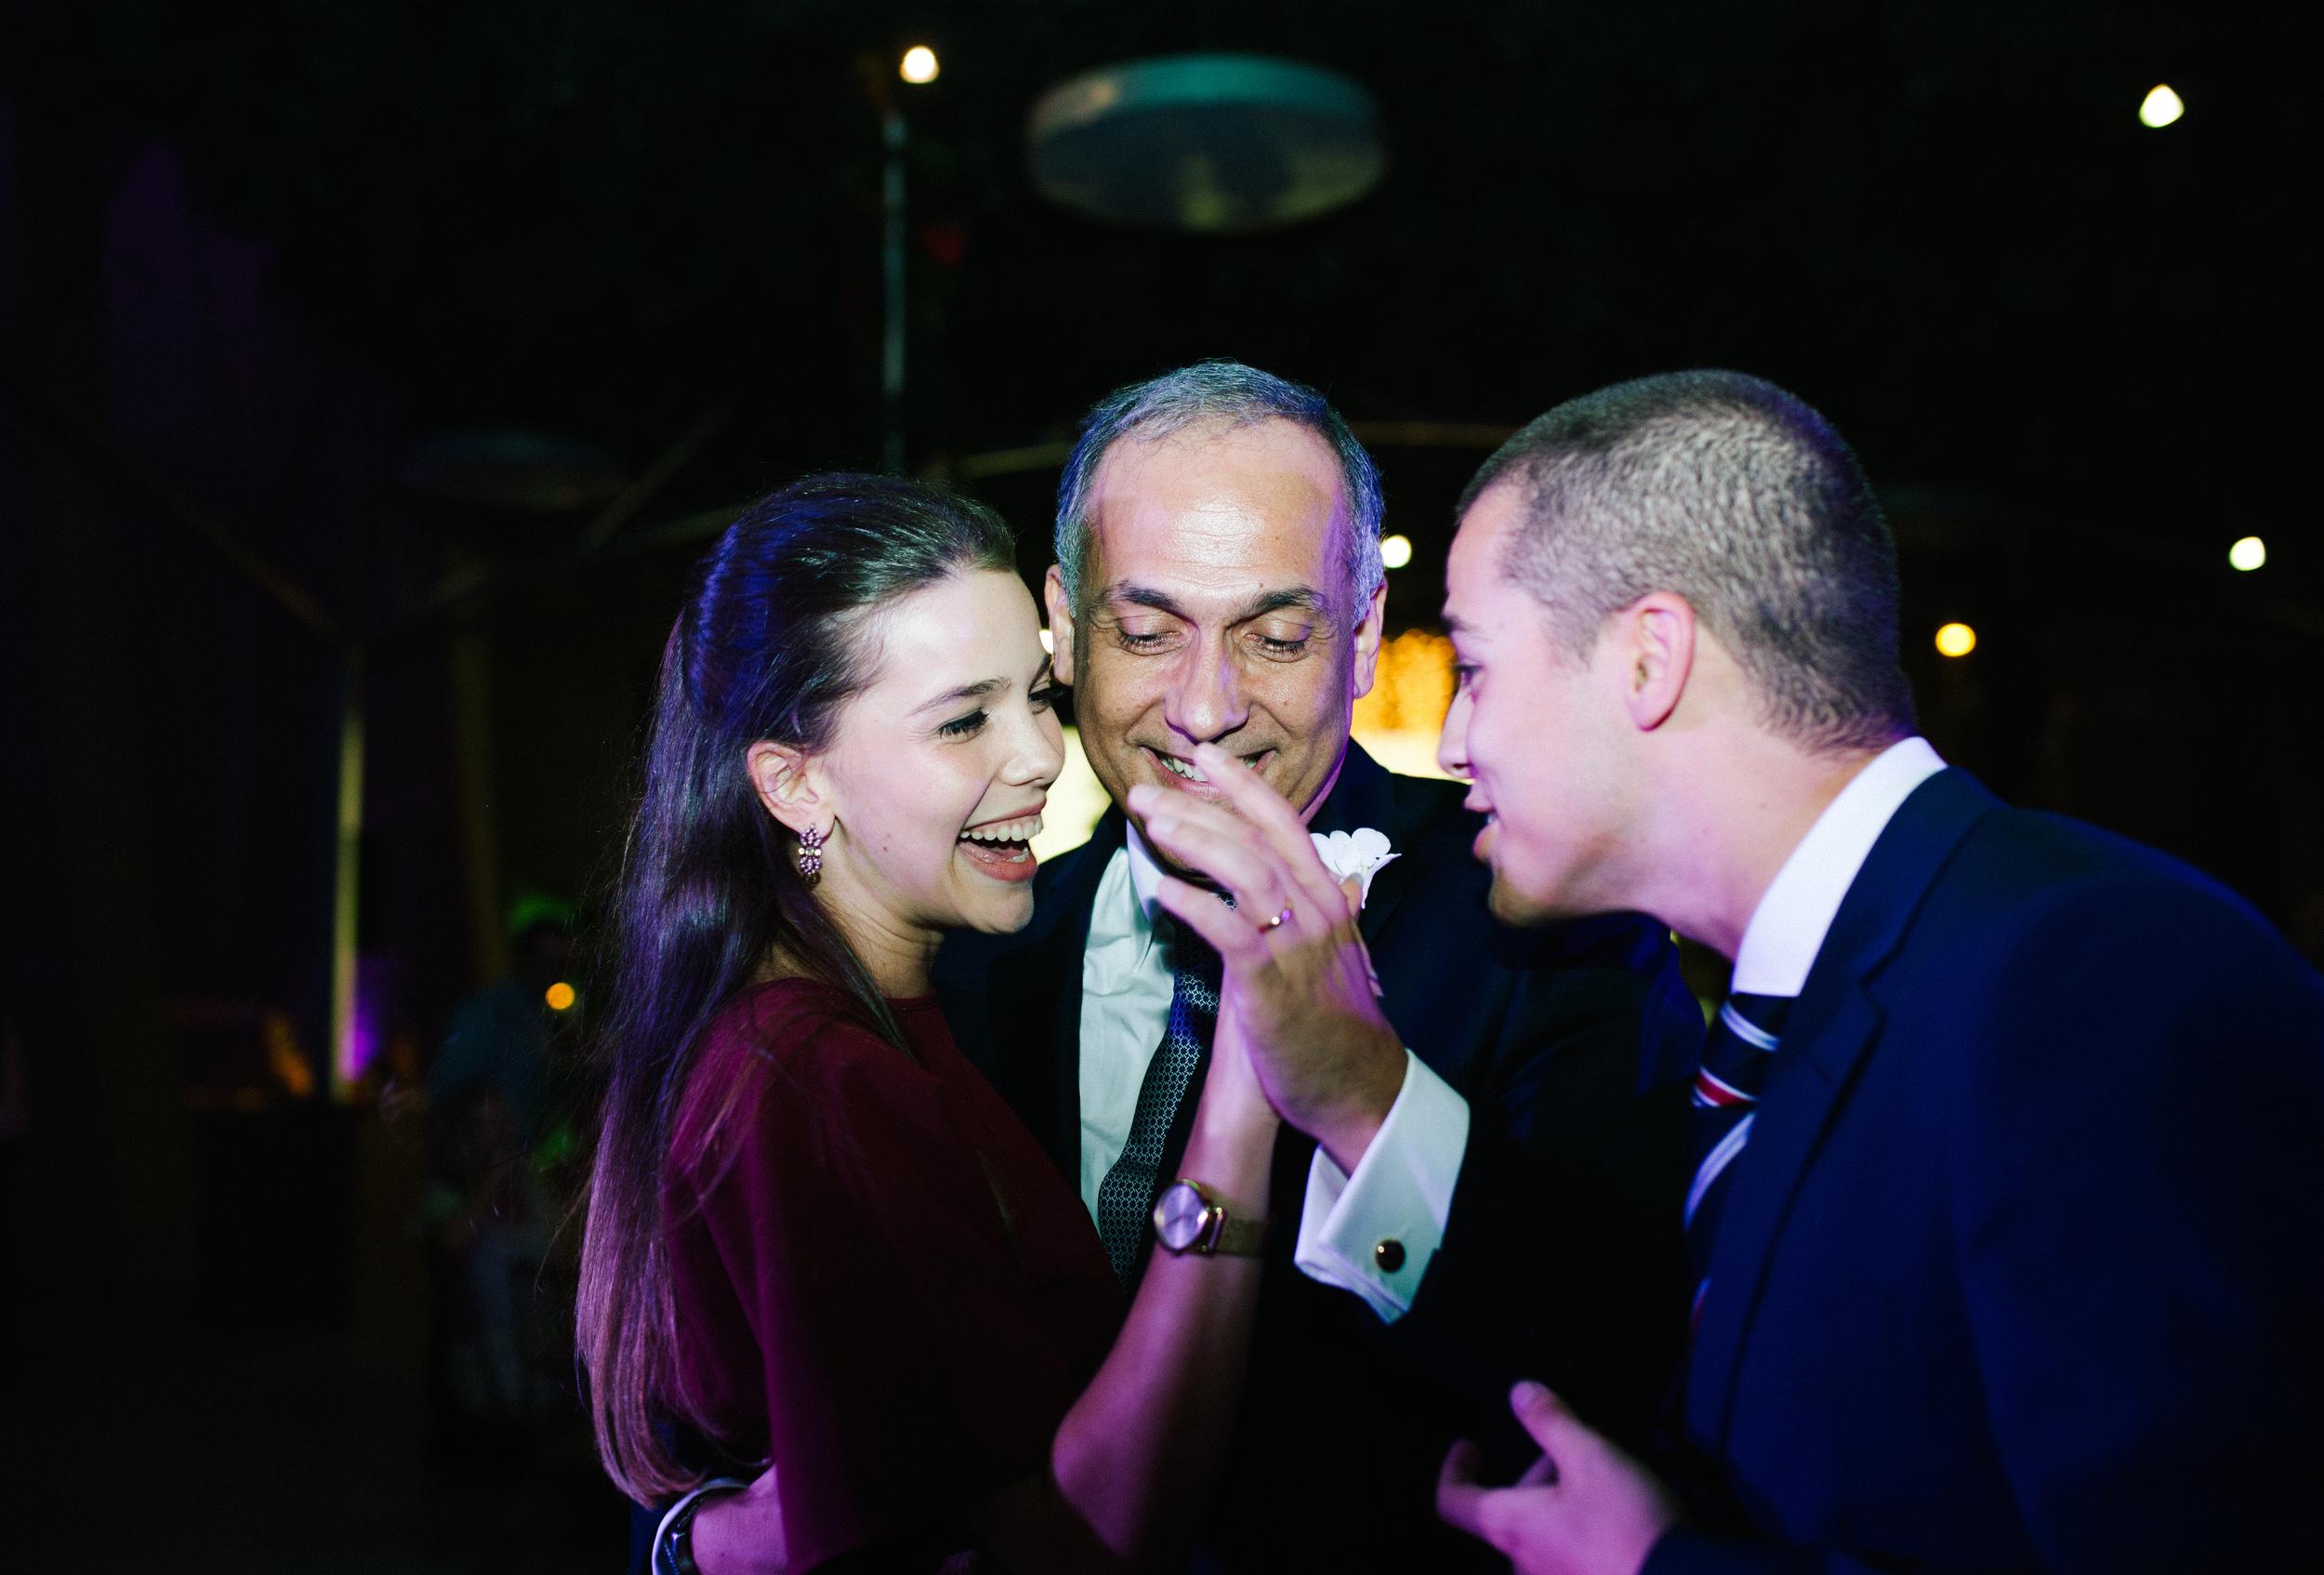 mariarao+wedding+estufa+fria-558.jpg